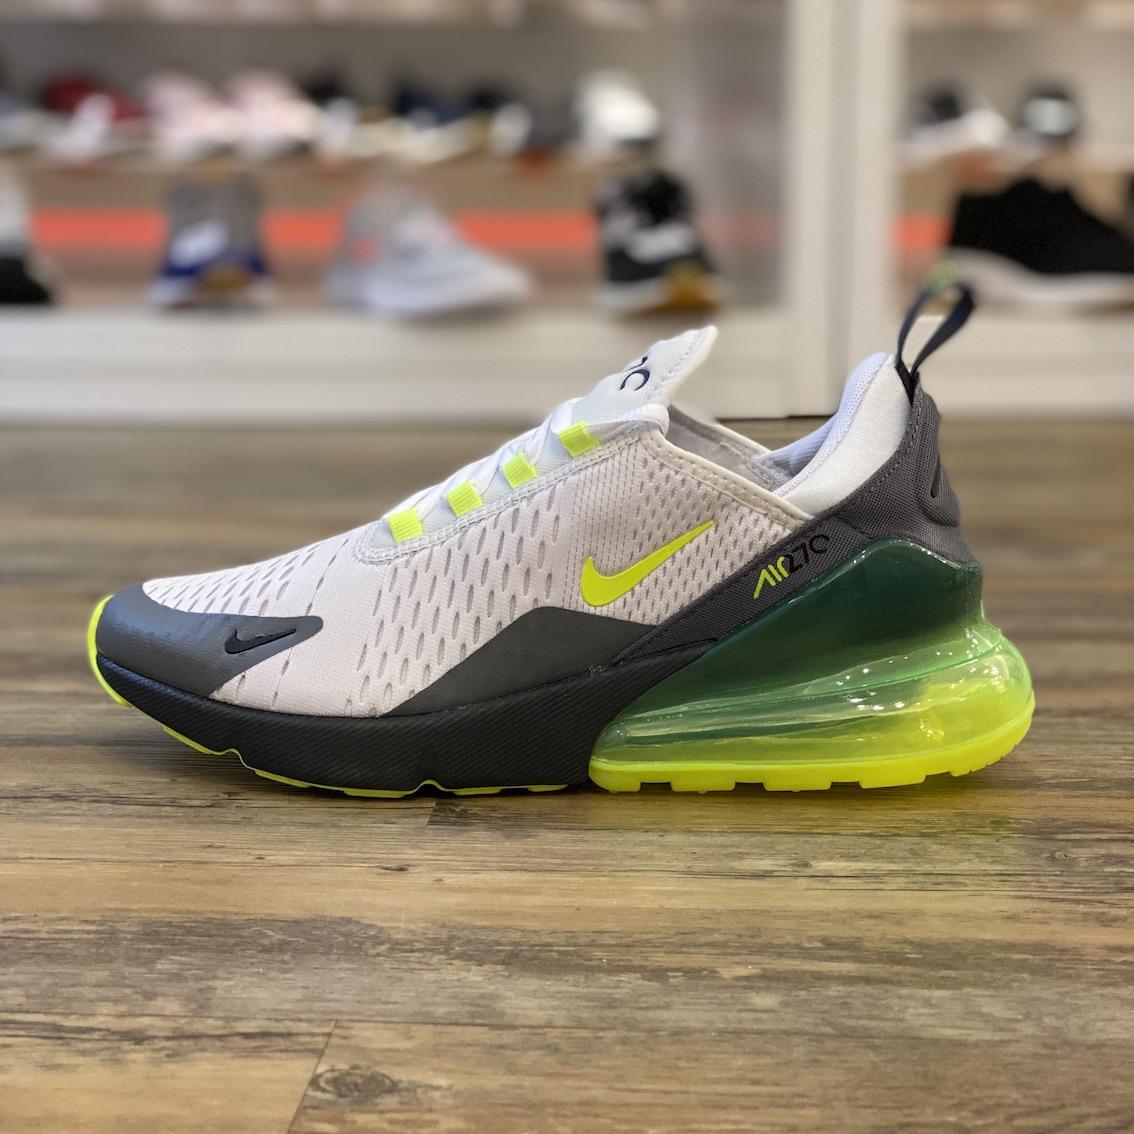 Detalles de Nike Air Max 270 Gr.45, 5 Zapatillas Deportivas Blanco Gris Running CJ0550 001